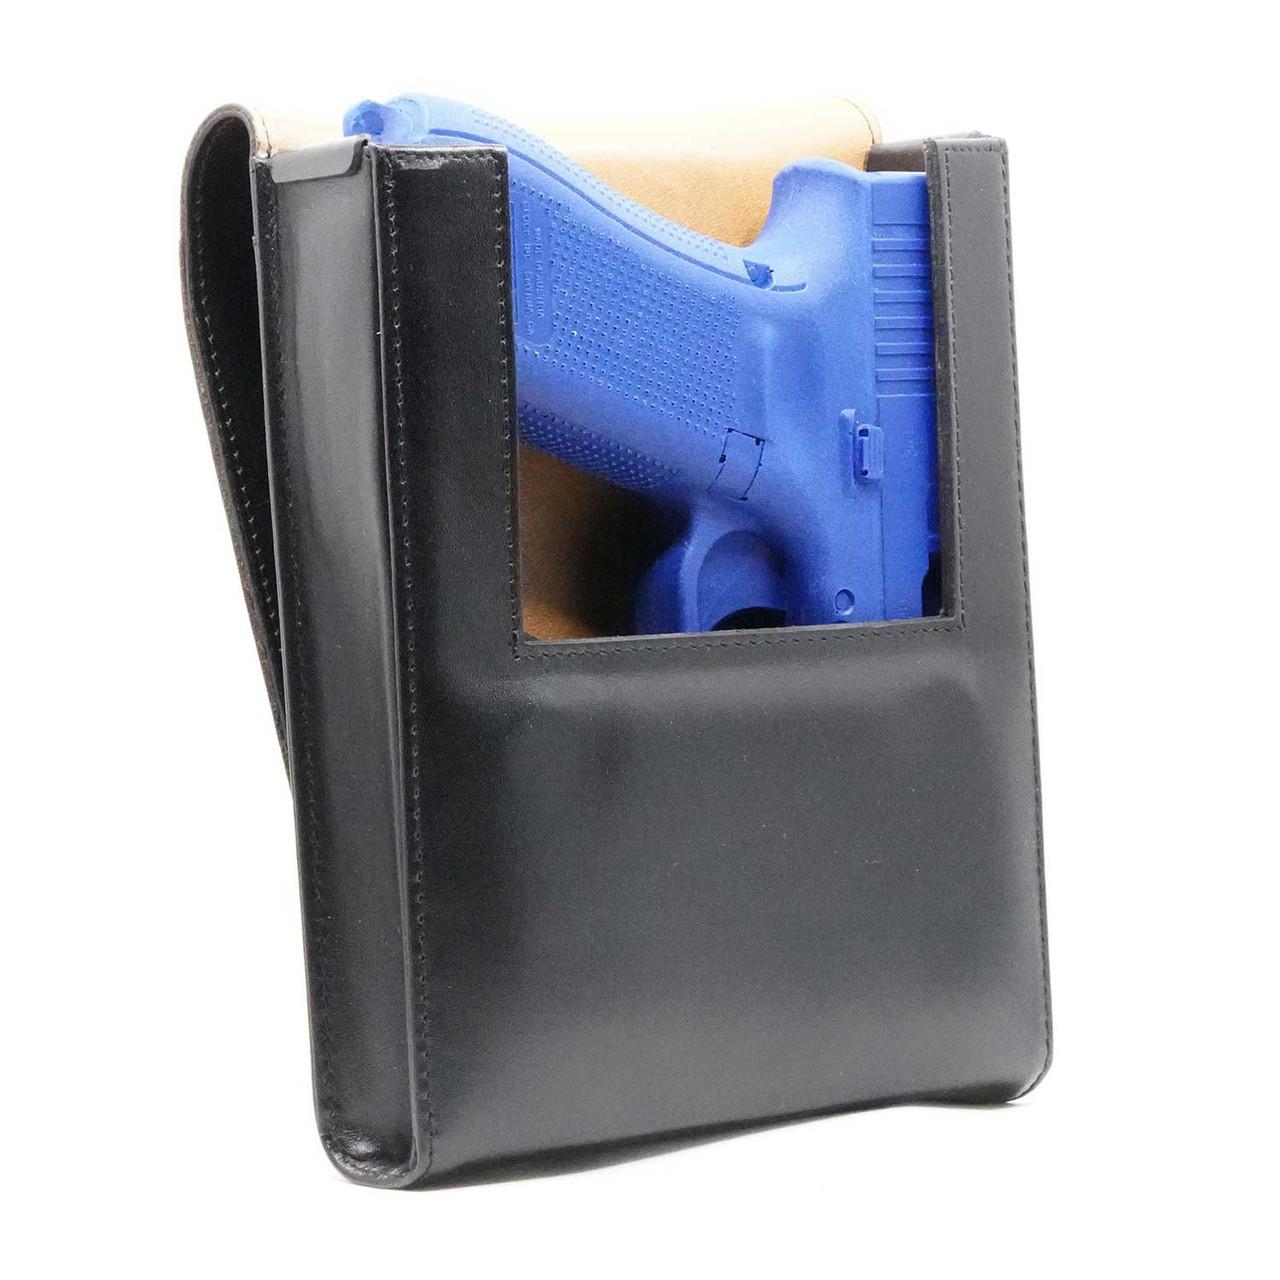 Glock 19X Concealed Carry Holster (Belt Loop)